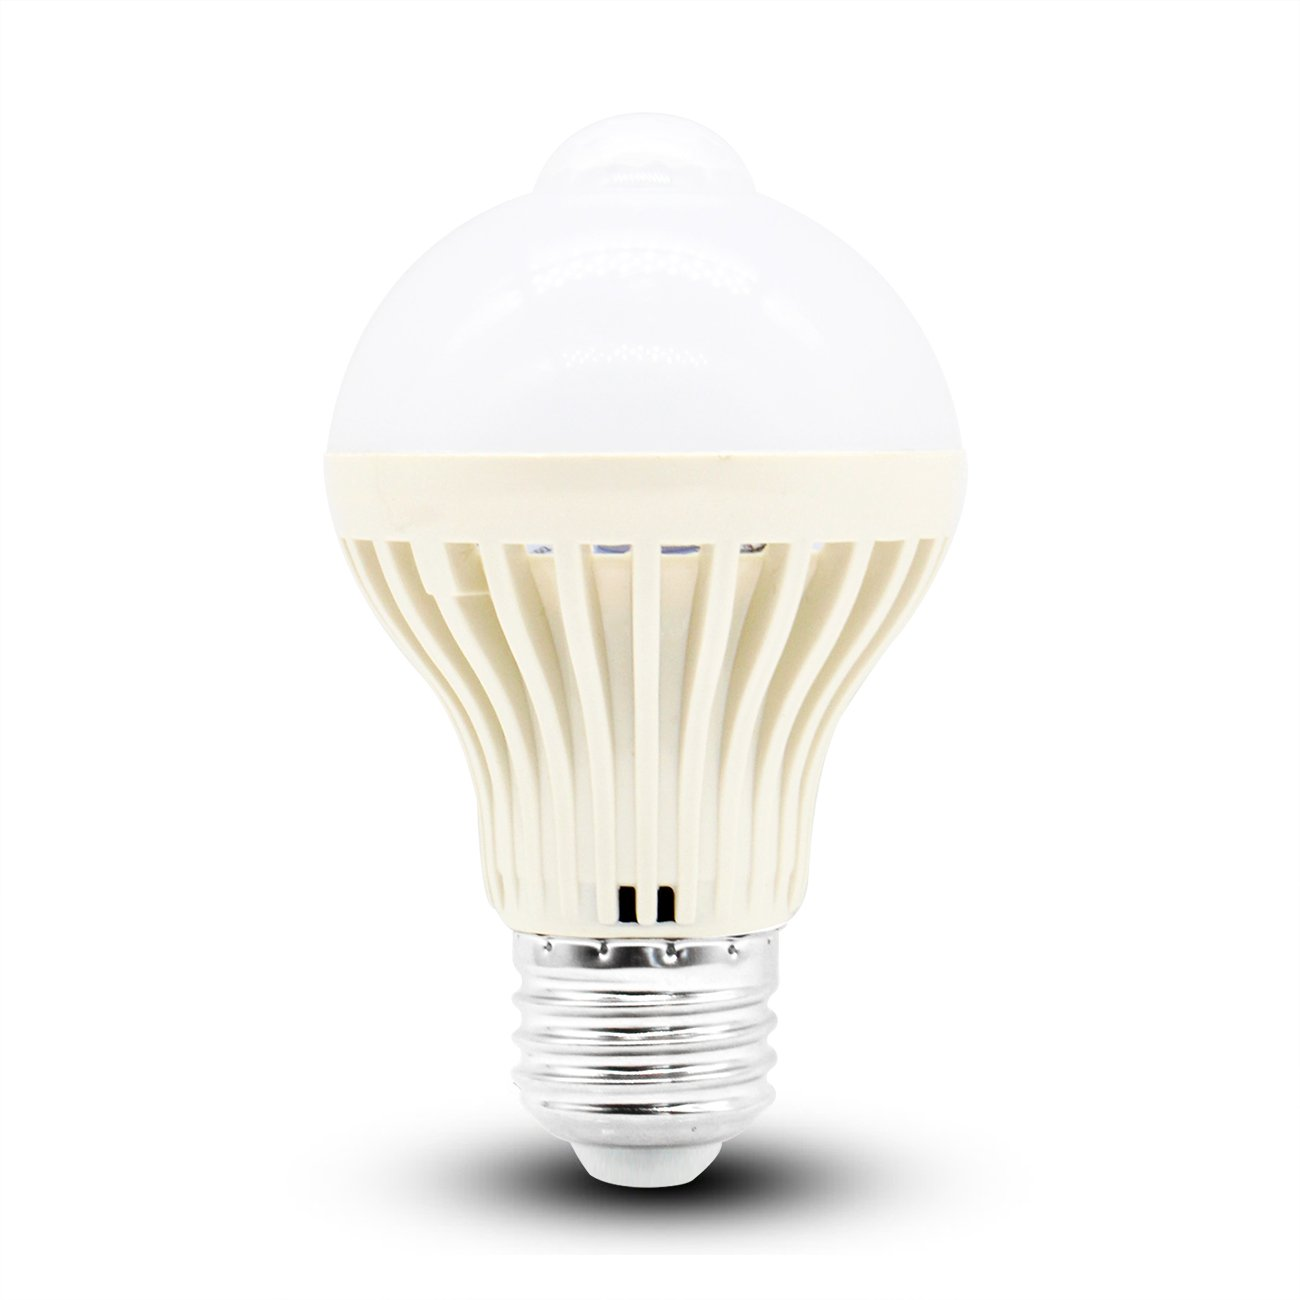 led電球 室内人感センサーライト 室内 E26口金 5W 明暗 人感センサー付 ト 昼白色 自動点灯/消灯 赤外線ランプ